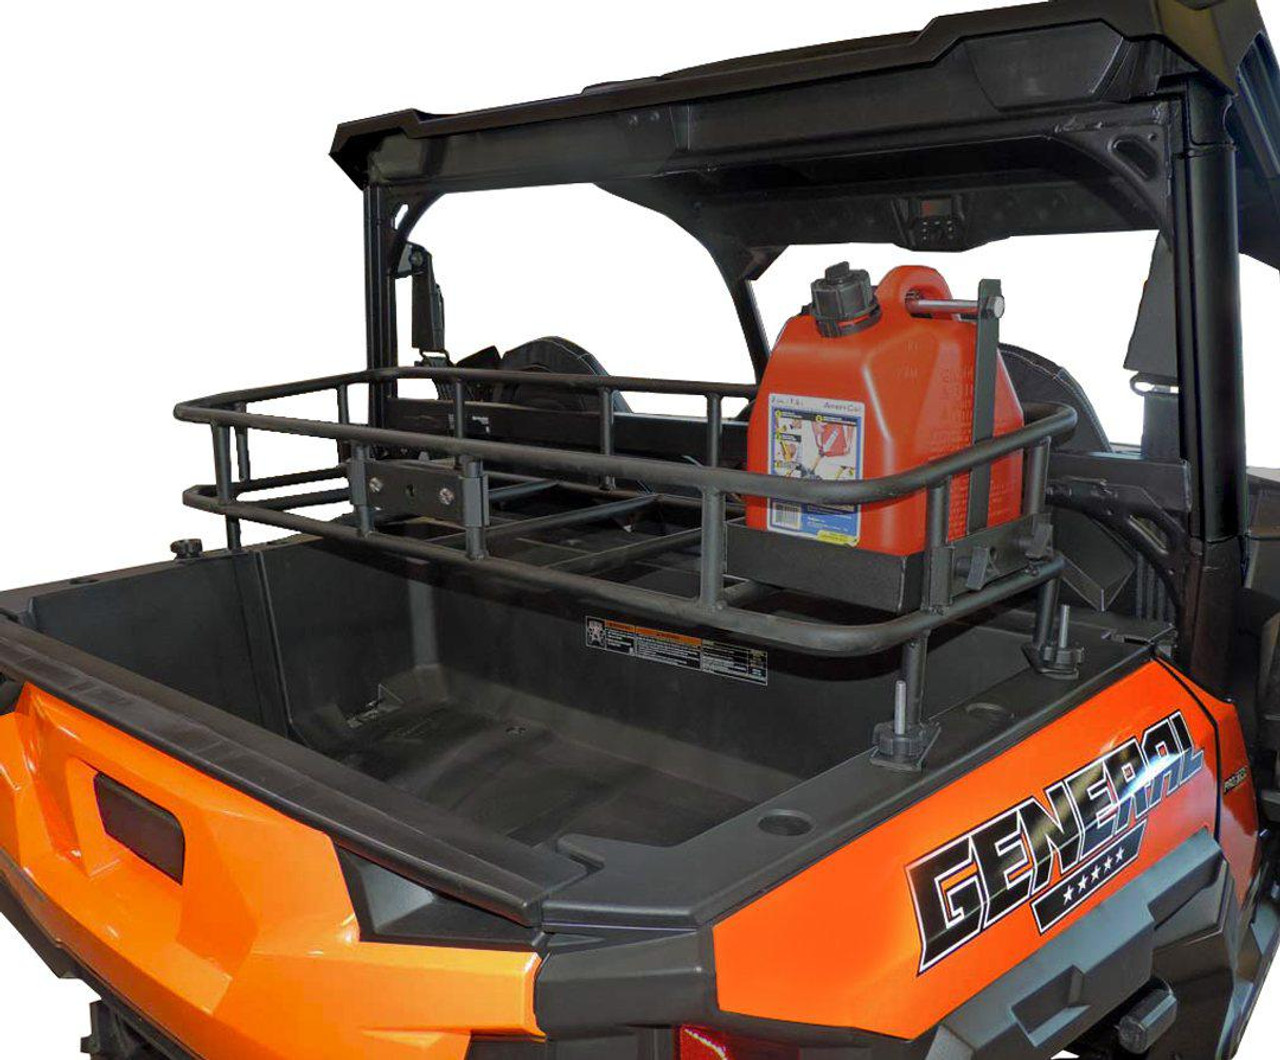 Polaris Ranger  General Twist Lock Anchors R-2001 Auto Parts & Accessories